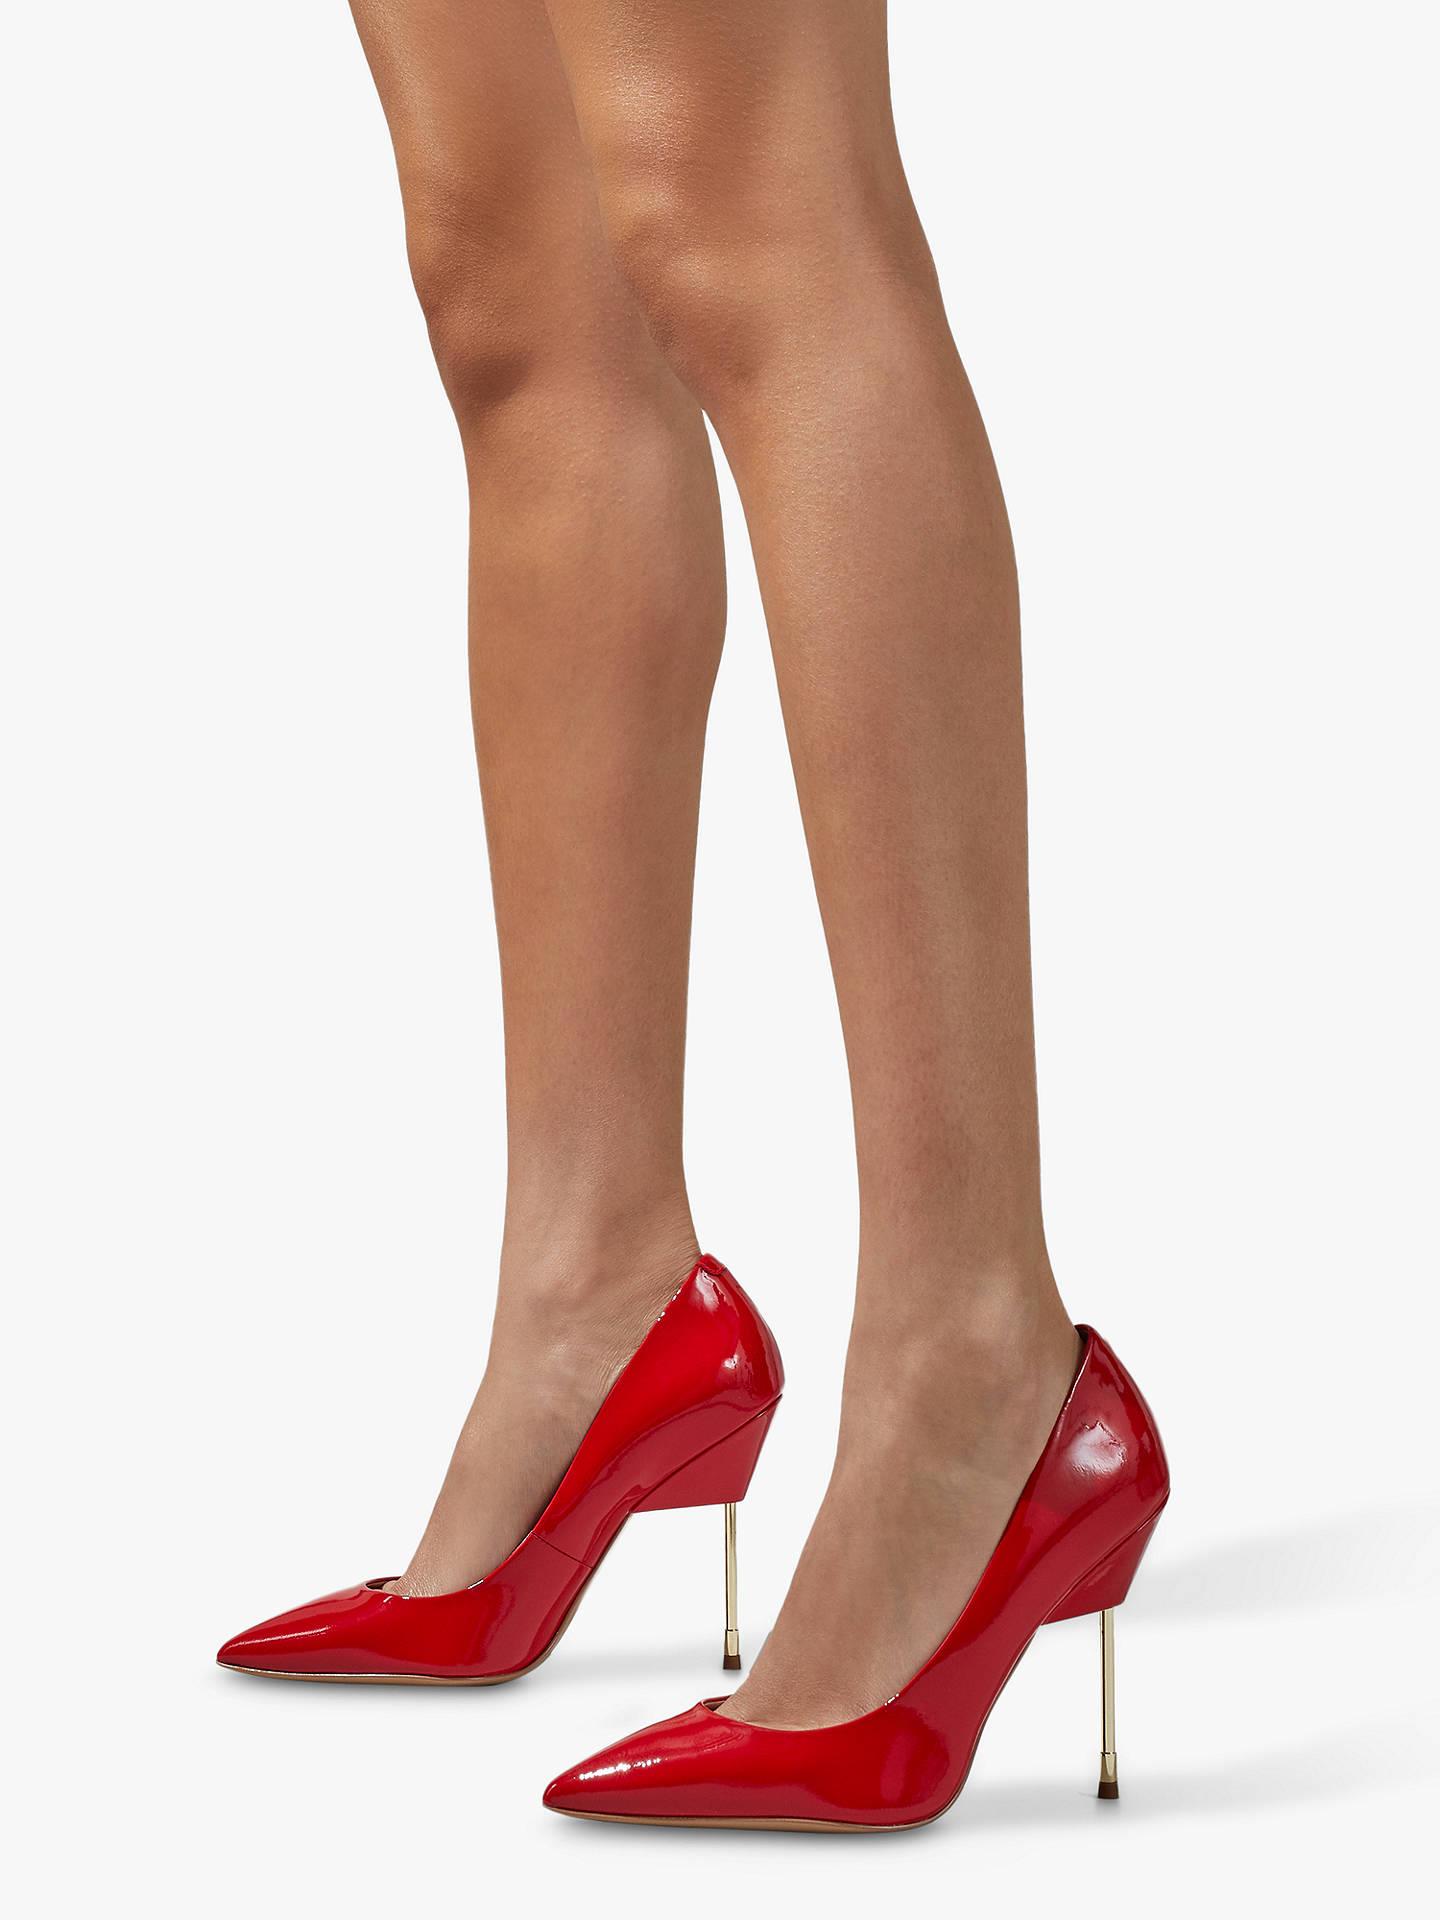 4874d2b03e1 Kurt Geiger London Britton Court Shoes, Bright Red Patent